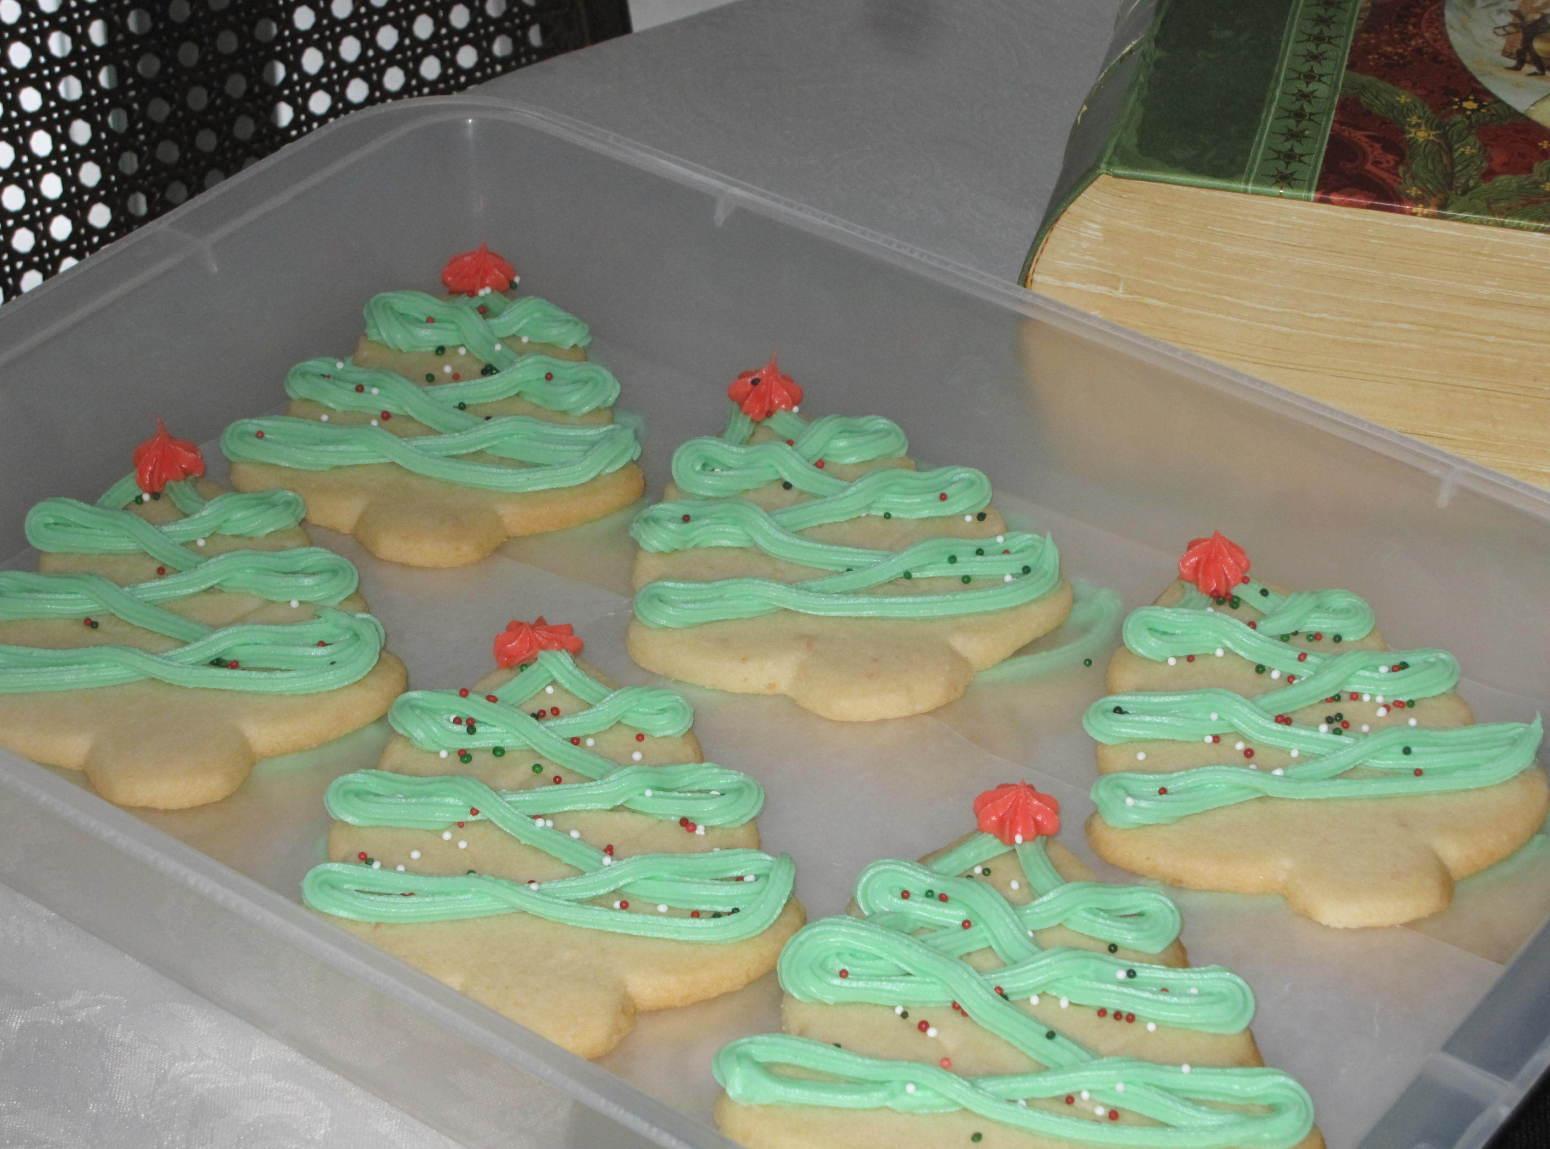 Panera Bread Buttery Shortbread Cookies Recipe